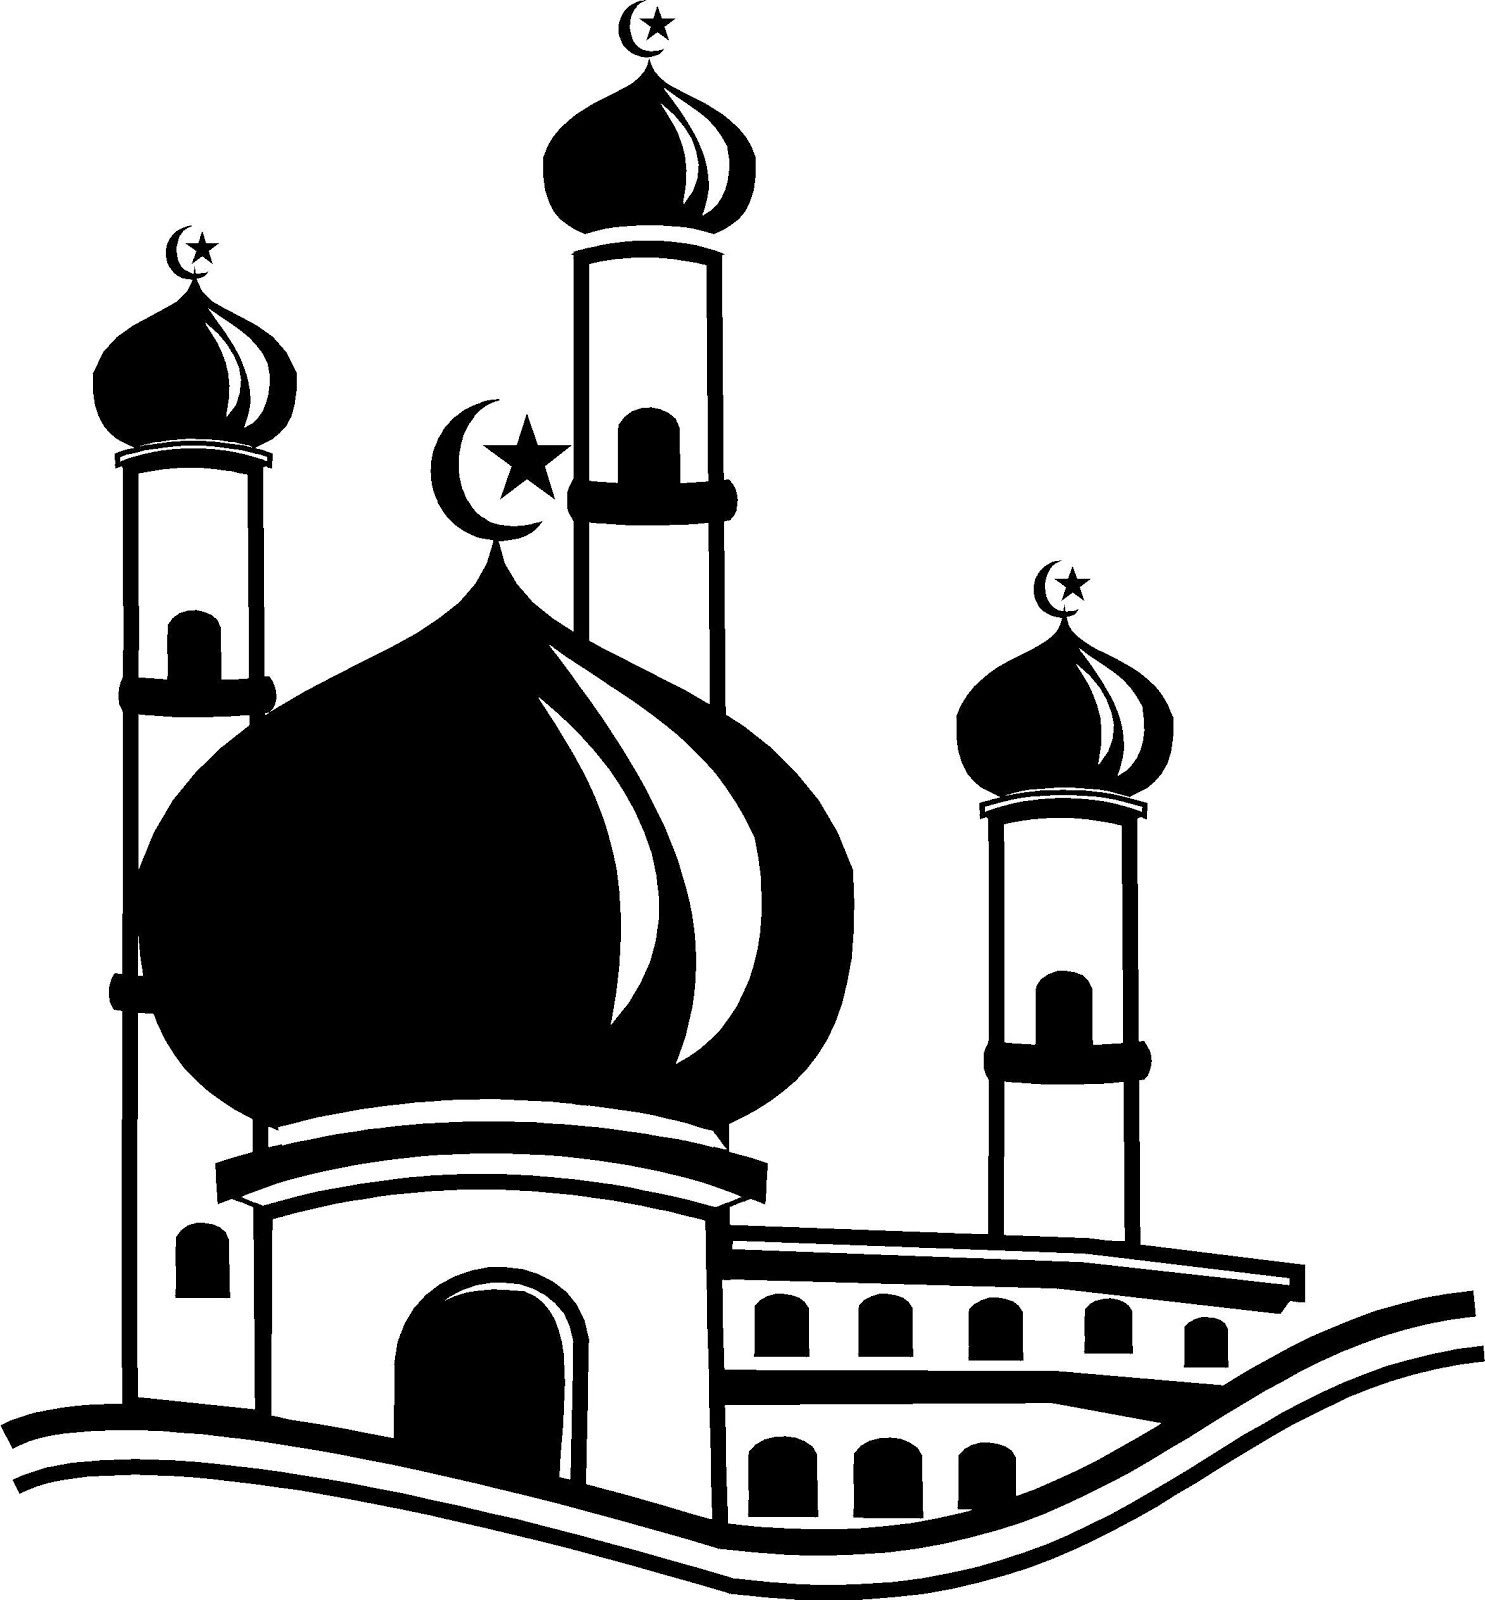 Gambar Kaligrafi Masjid Hitam Putih